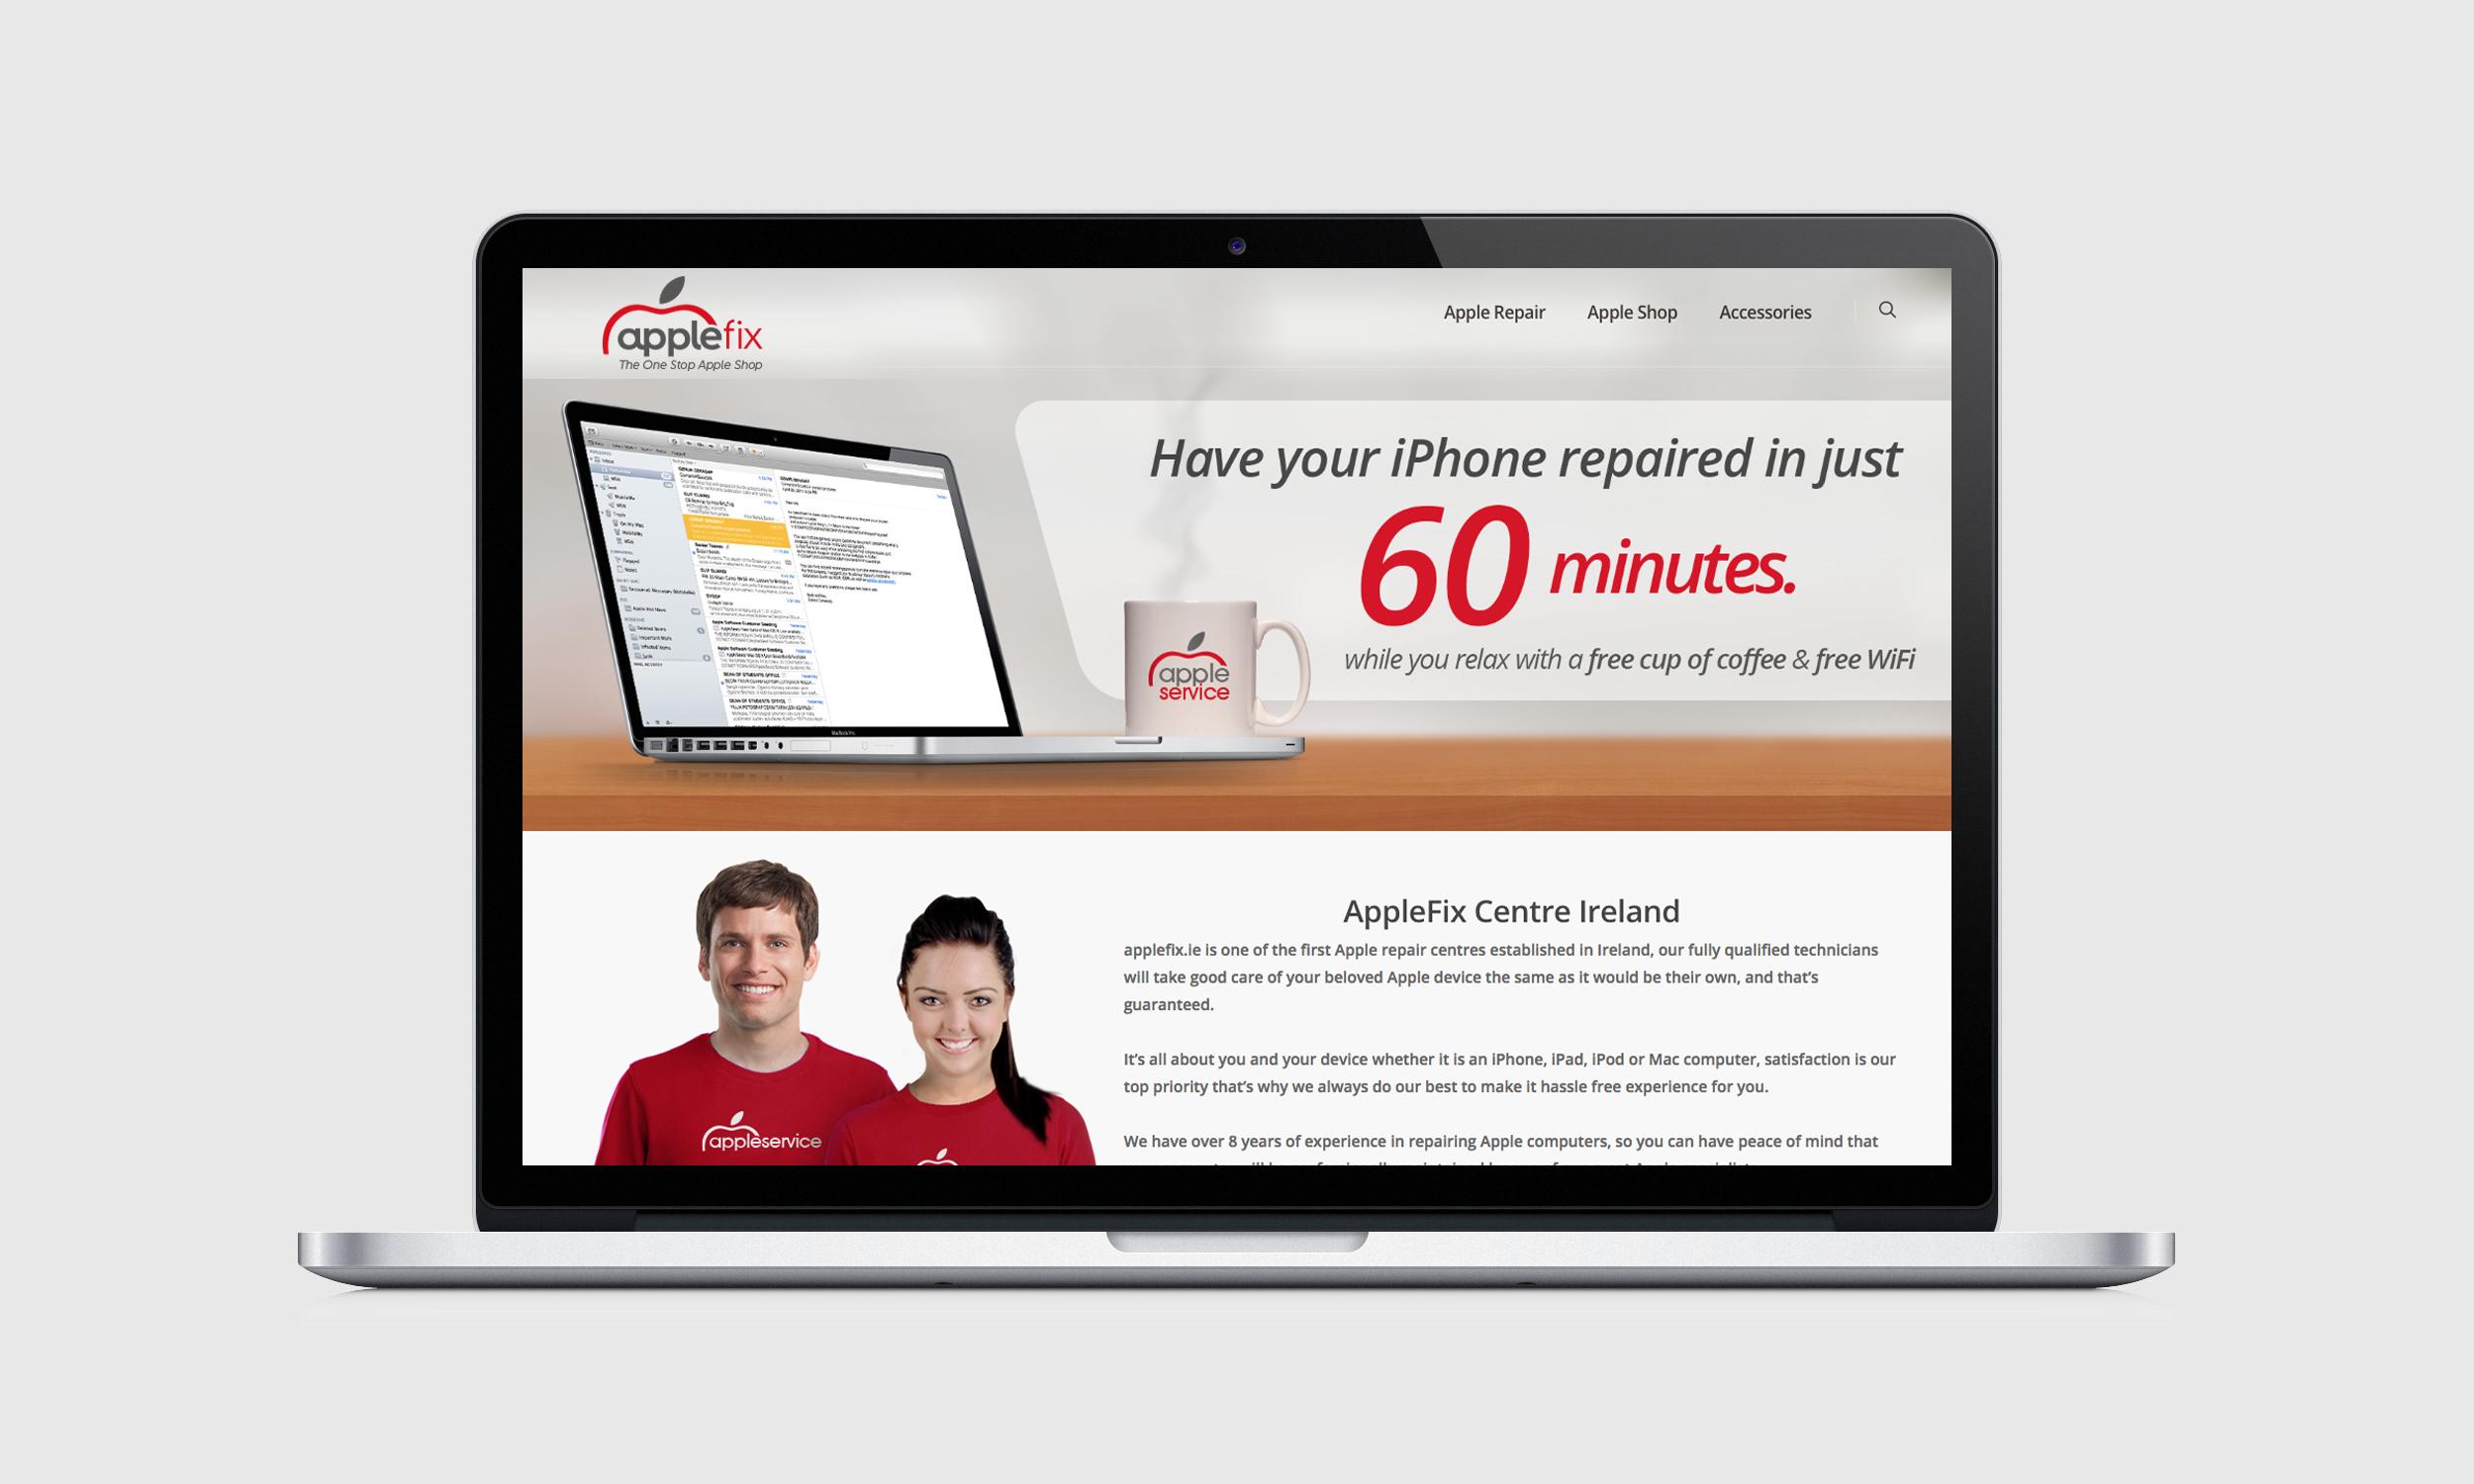 webappleservice